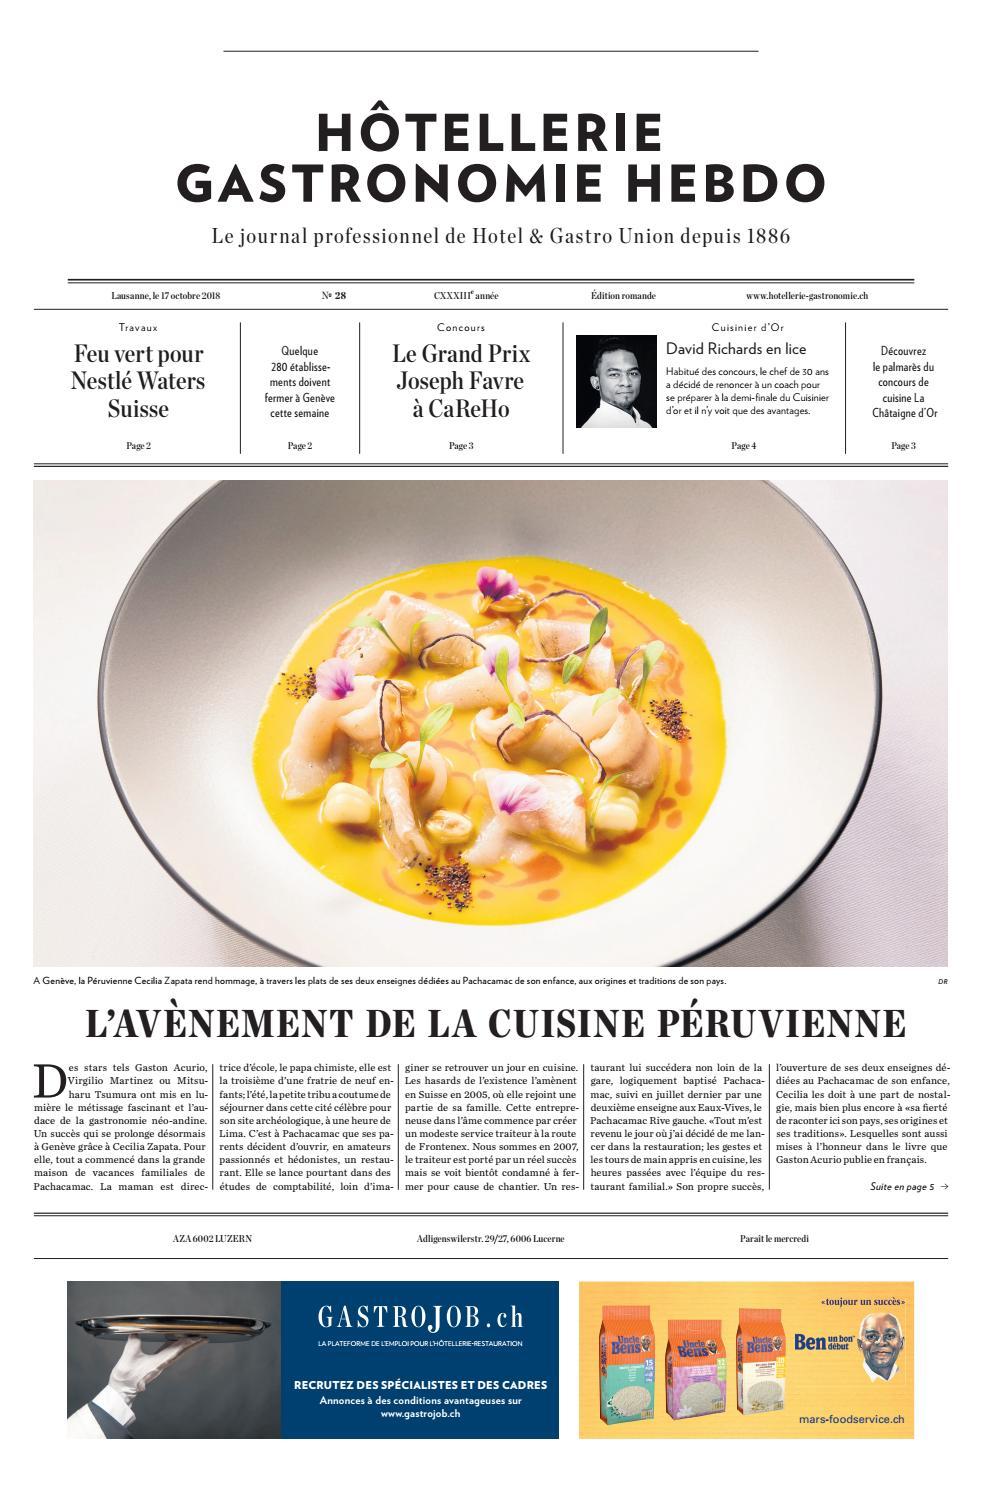 Hg Hebdo 28 2018 By Hotellerie Gastronomie Verlag Issuu